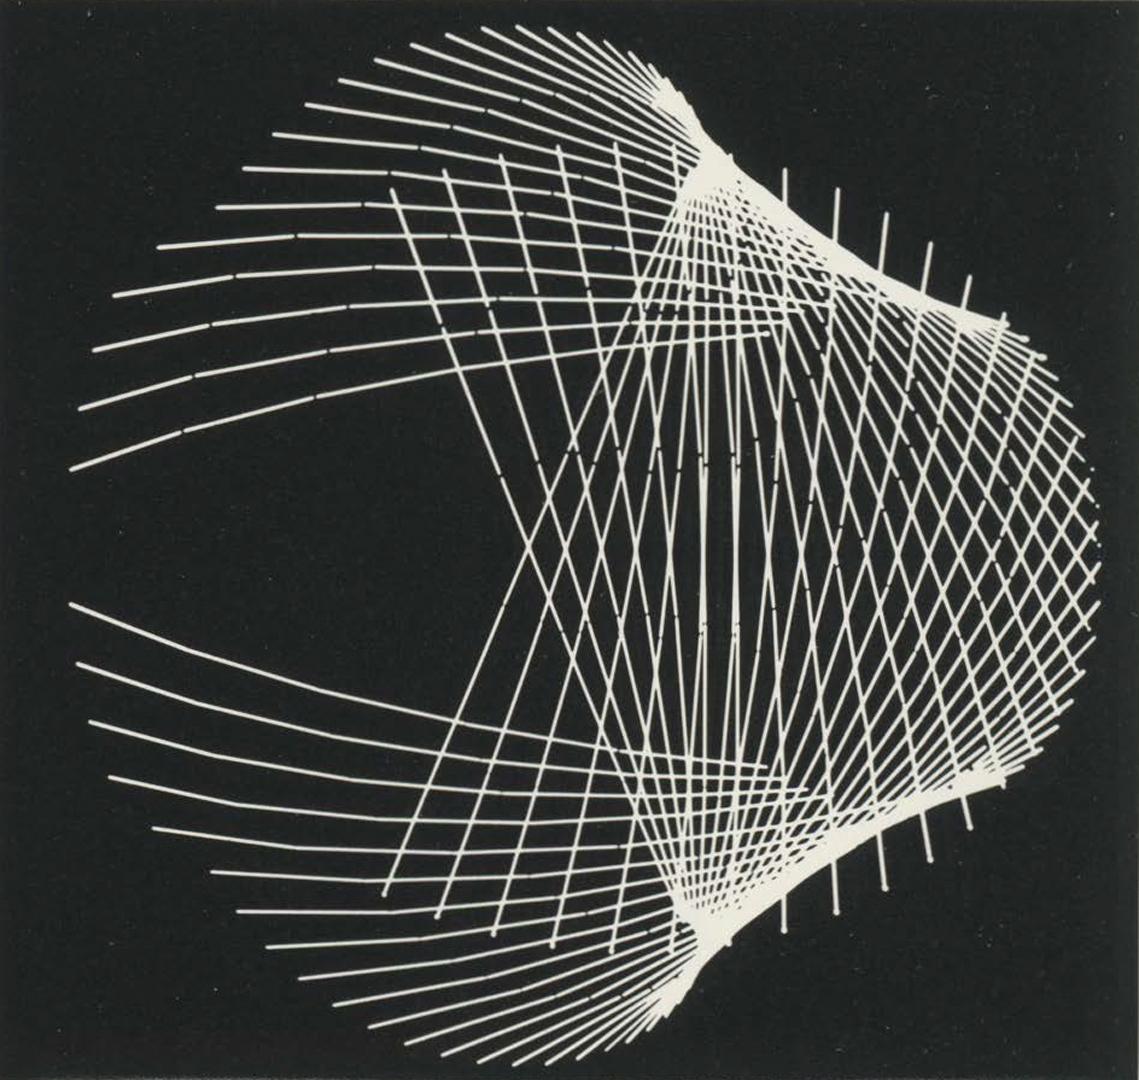 ©1956, Herbert W. Franke